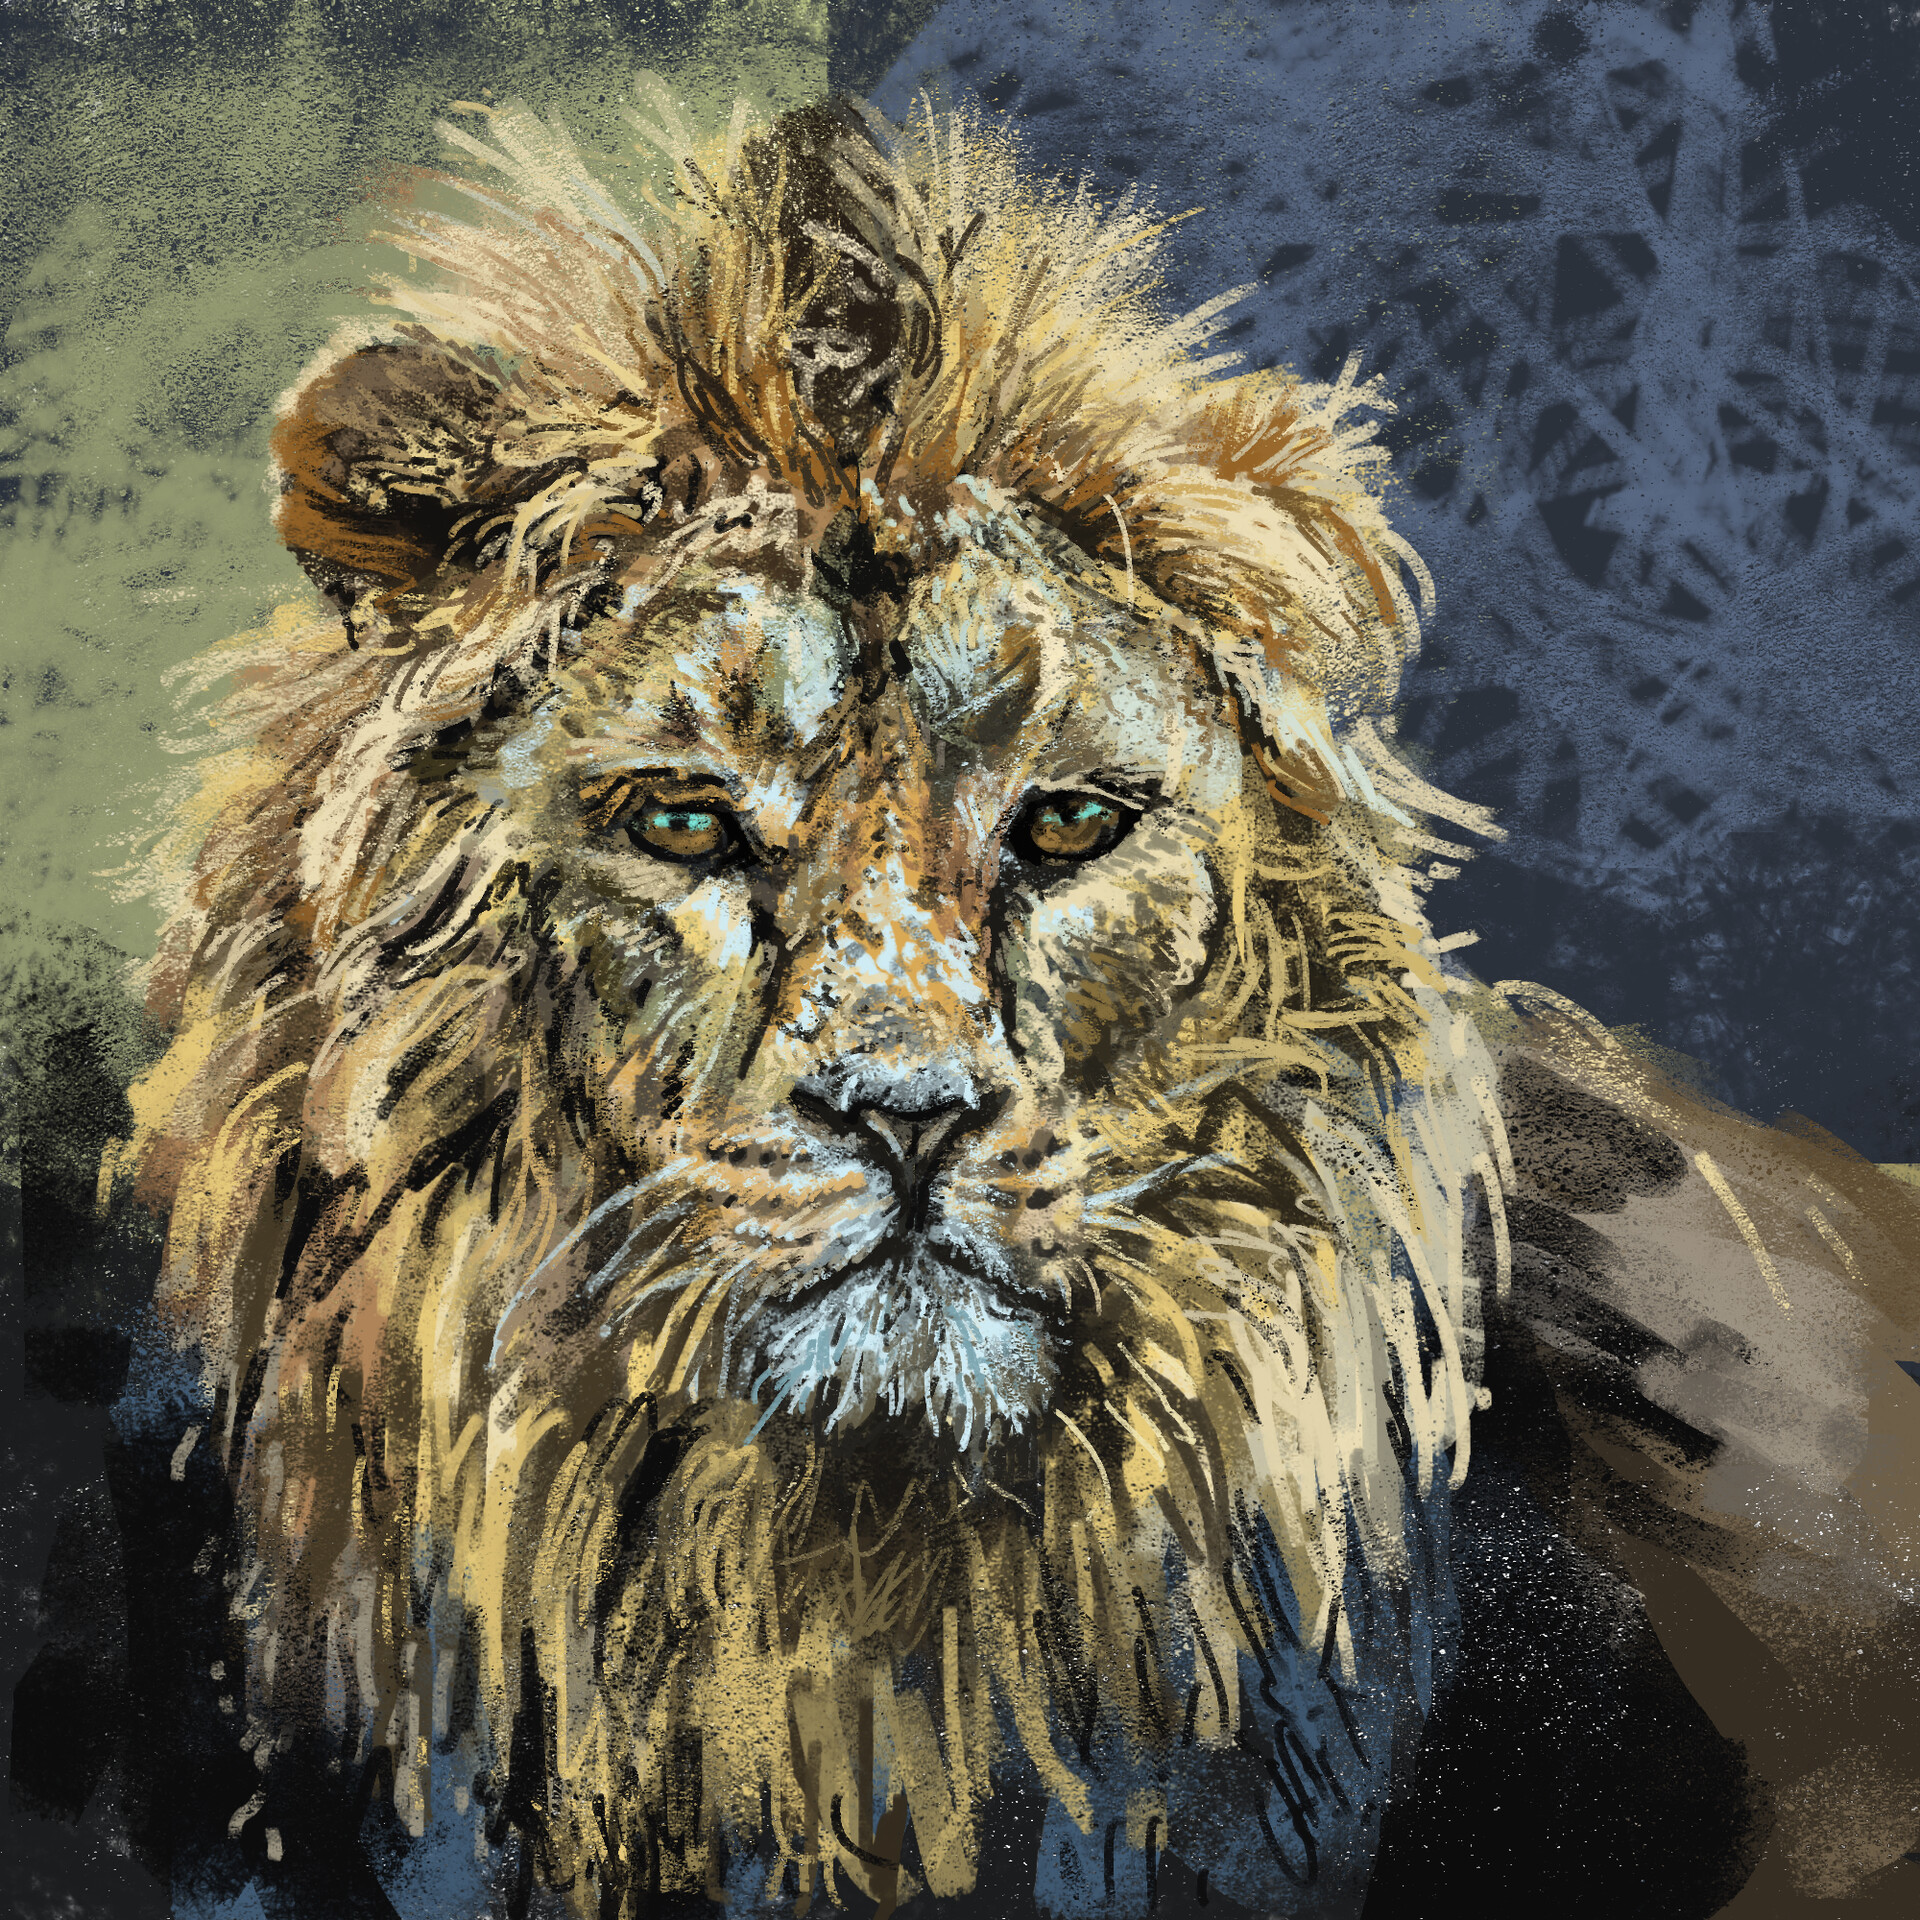 19 Reference: https://cdn.pixabay.com/photo/2019/08/27/18/18/lion-4434855_960_720.jpg